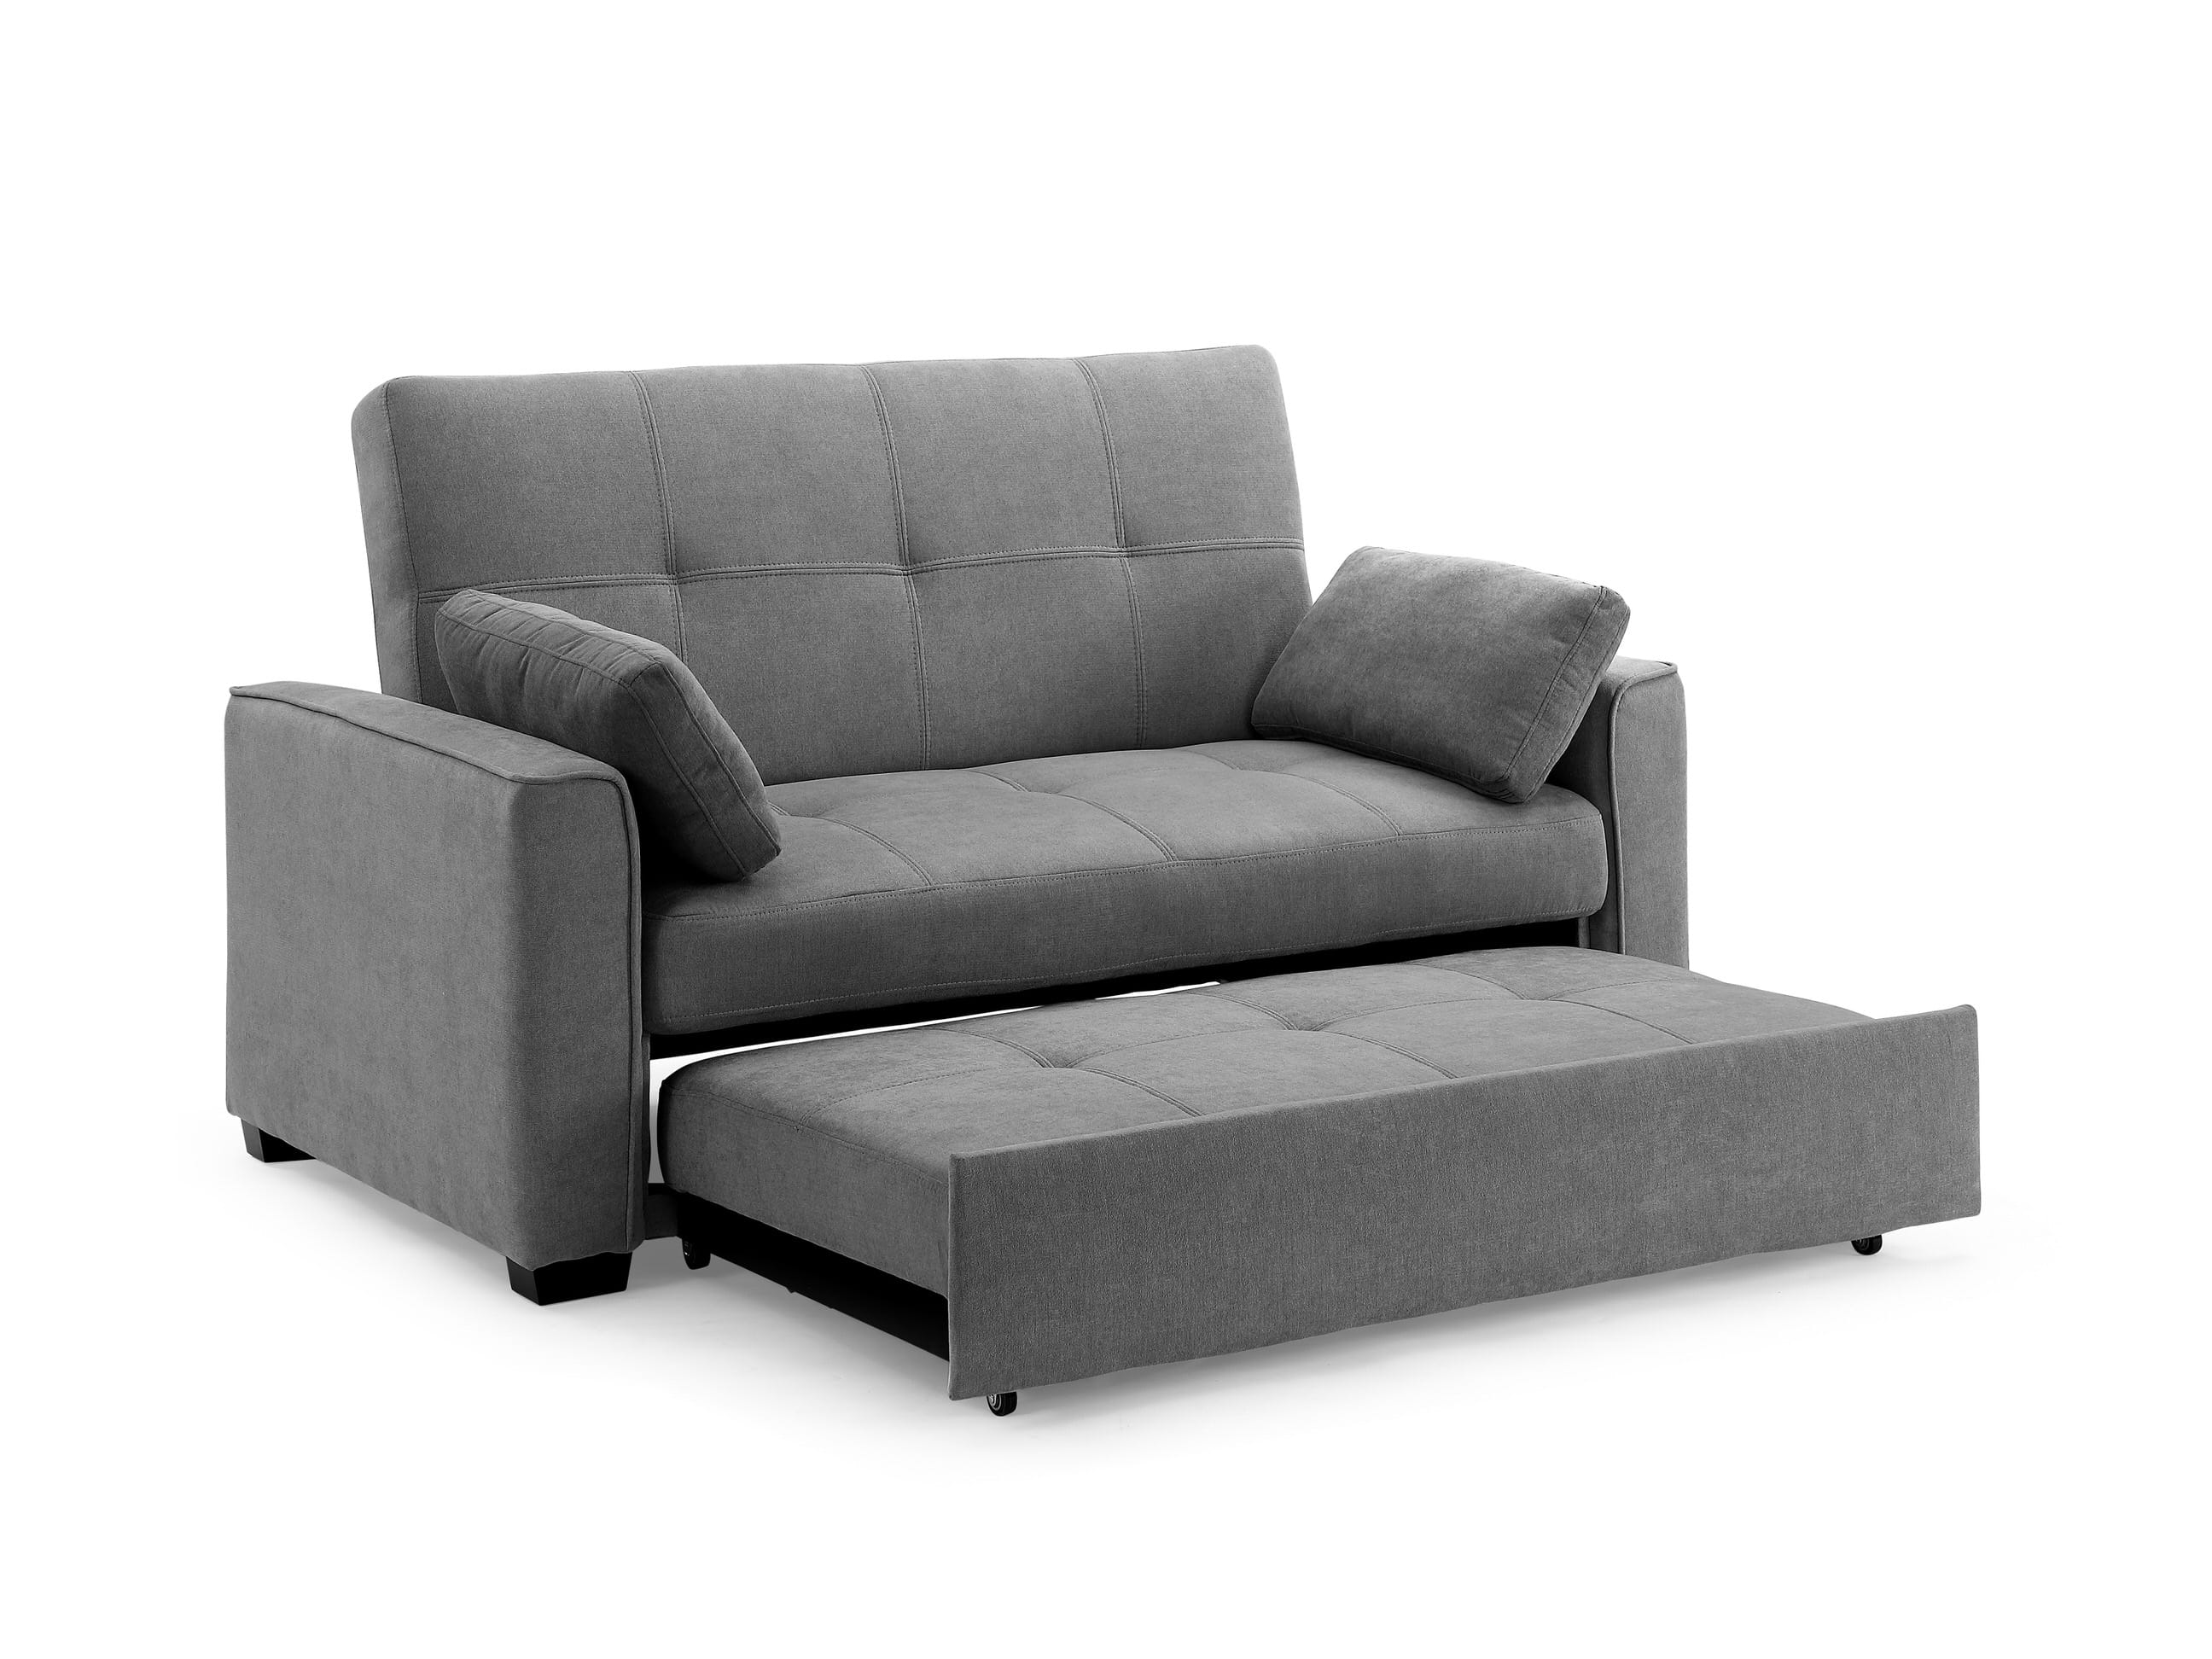 Nantucket Loveseat Full Size Sleeper Light Gray By Night Day Furniture